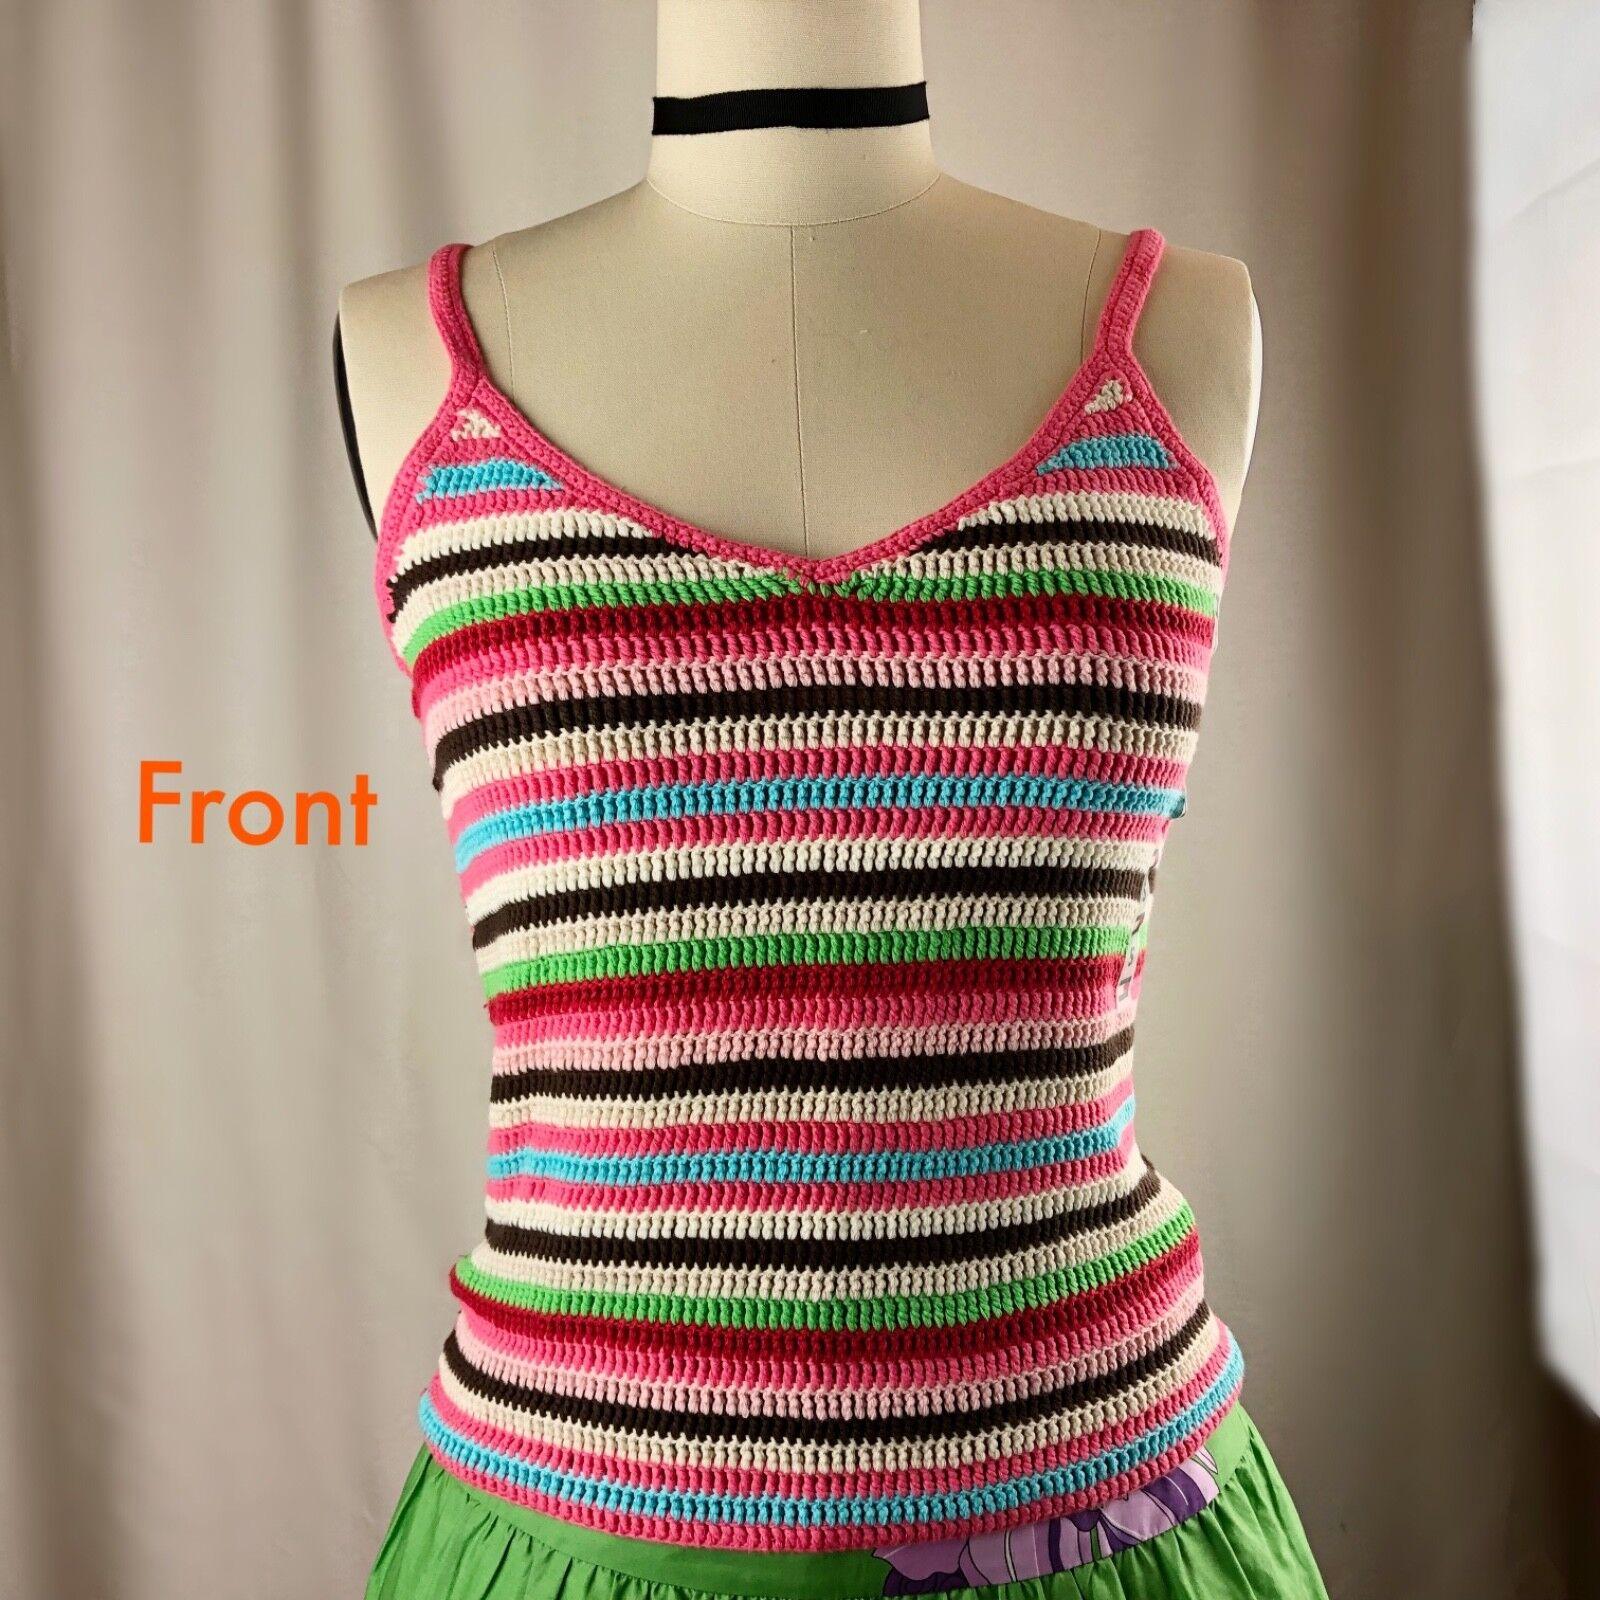 Tommy Hilfiger Henley Women Tank  Cami Top Shirt 2 pcs Small Medium Large Gift